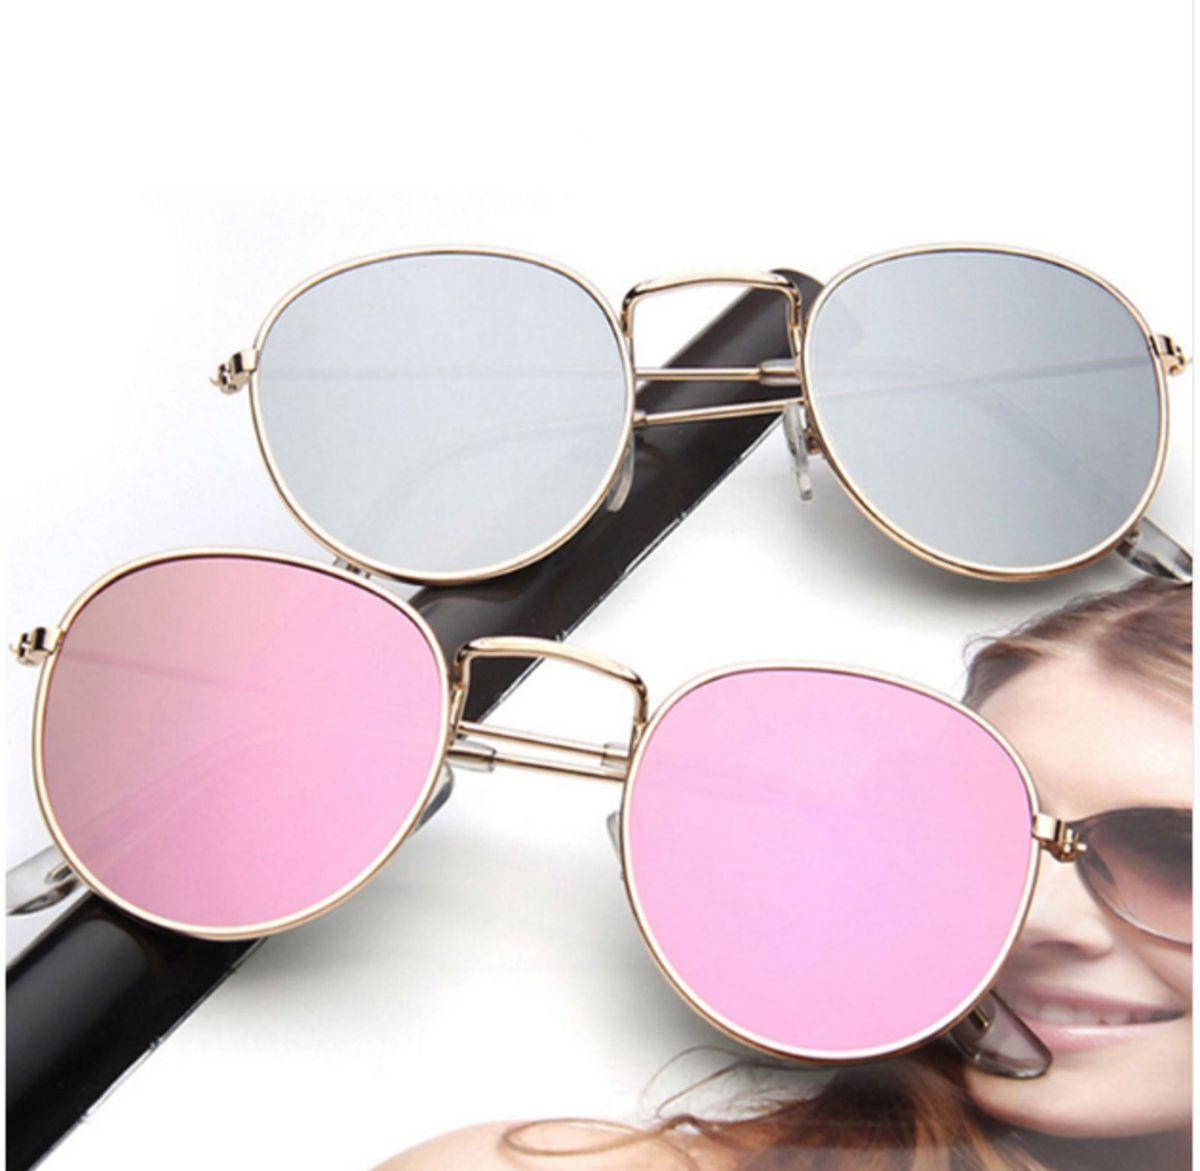 eaab68f0a óculos de sol redondo rosa - óculos meikai.  Czm6ly9wag90b3muzw5qb2vplmnvbs5ici9wcm9kdwn0cy82njk5oda1lzrmyjrmnjuzmddhzwywnjk4mmqzogrinwe3n2ixmzy2lmpwzw